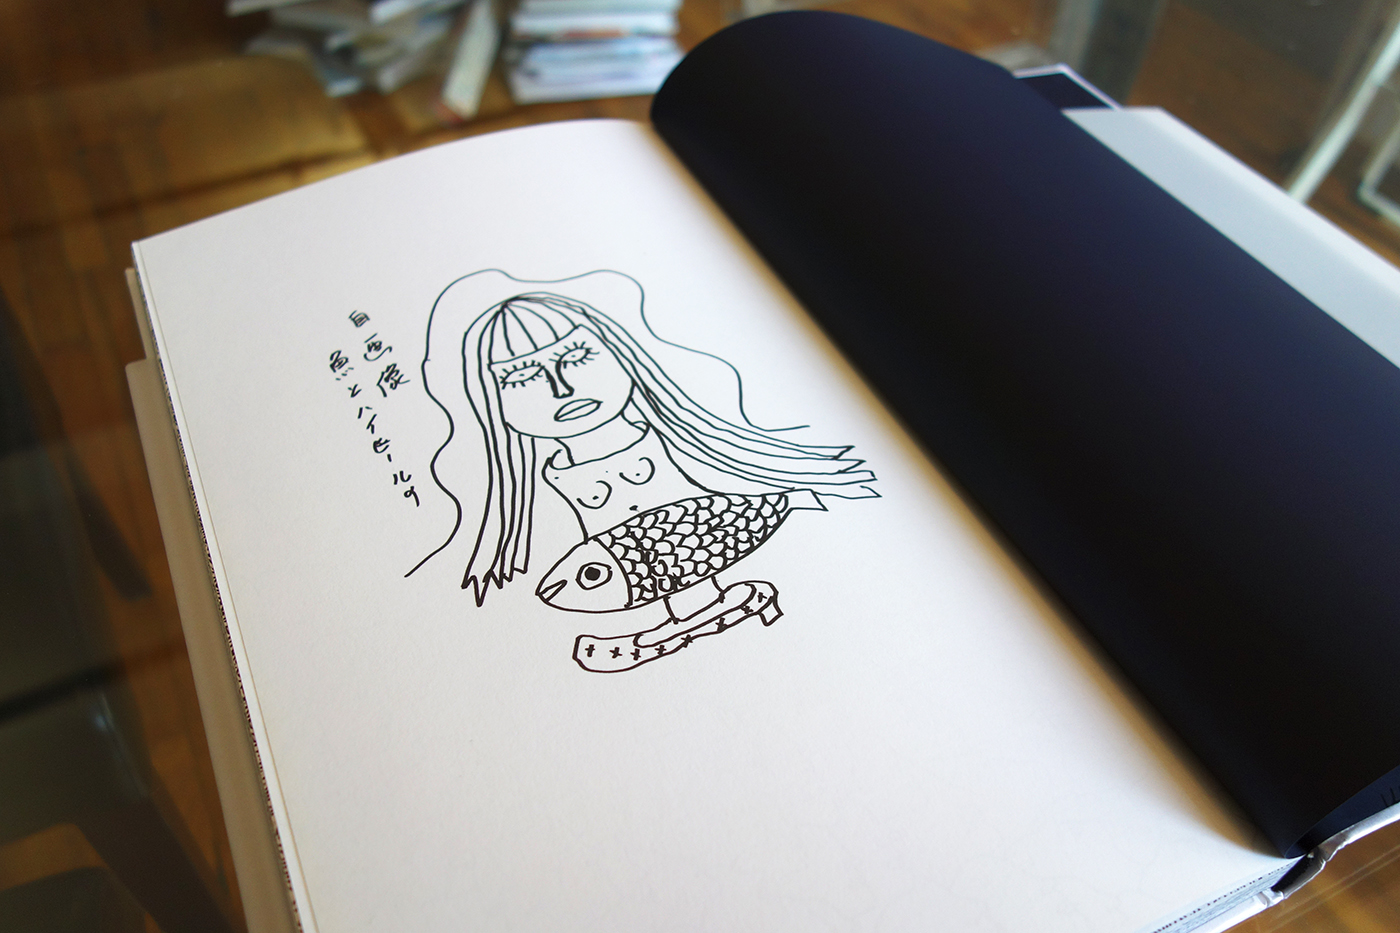 A New Wave Little Mermaid Illustrated By Yayoi Kusama